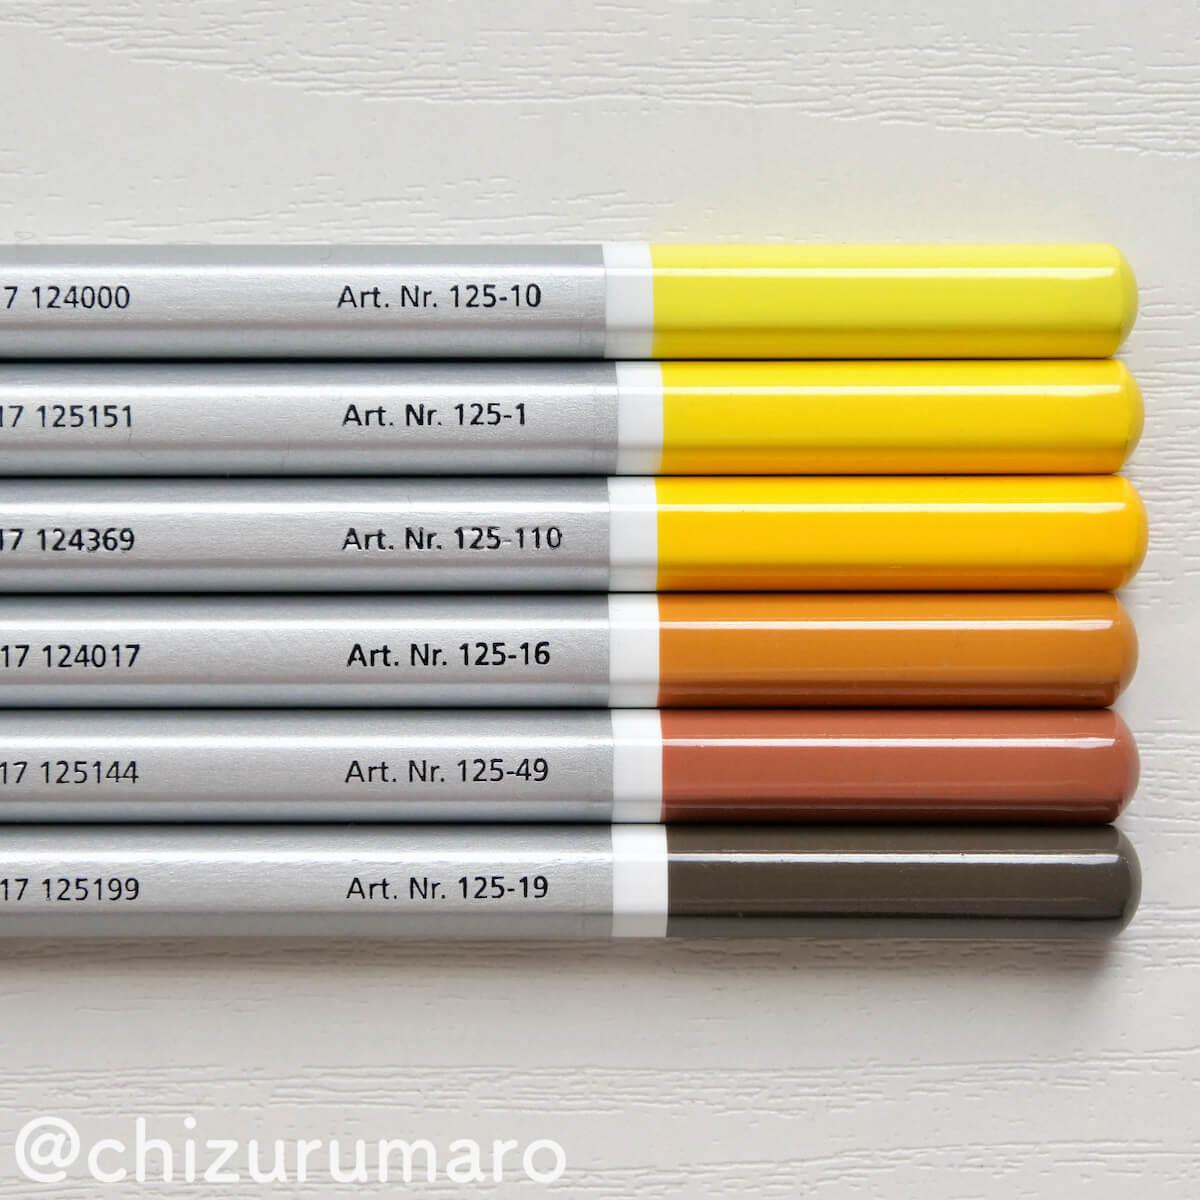 f:id:chizurumaro:20201126112145j:plain